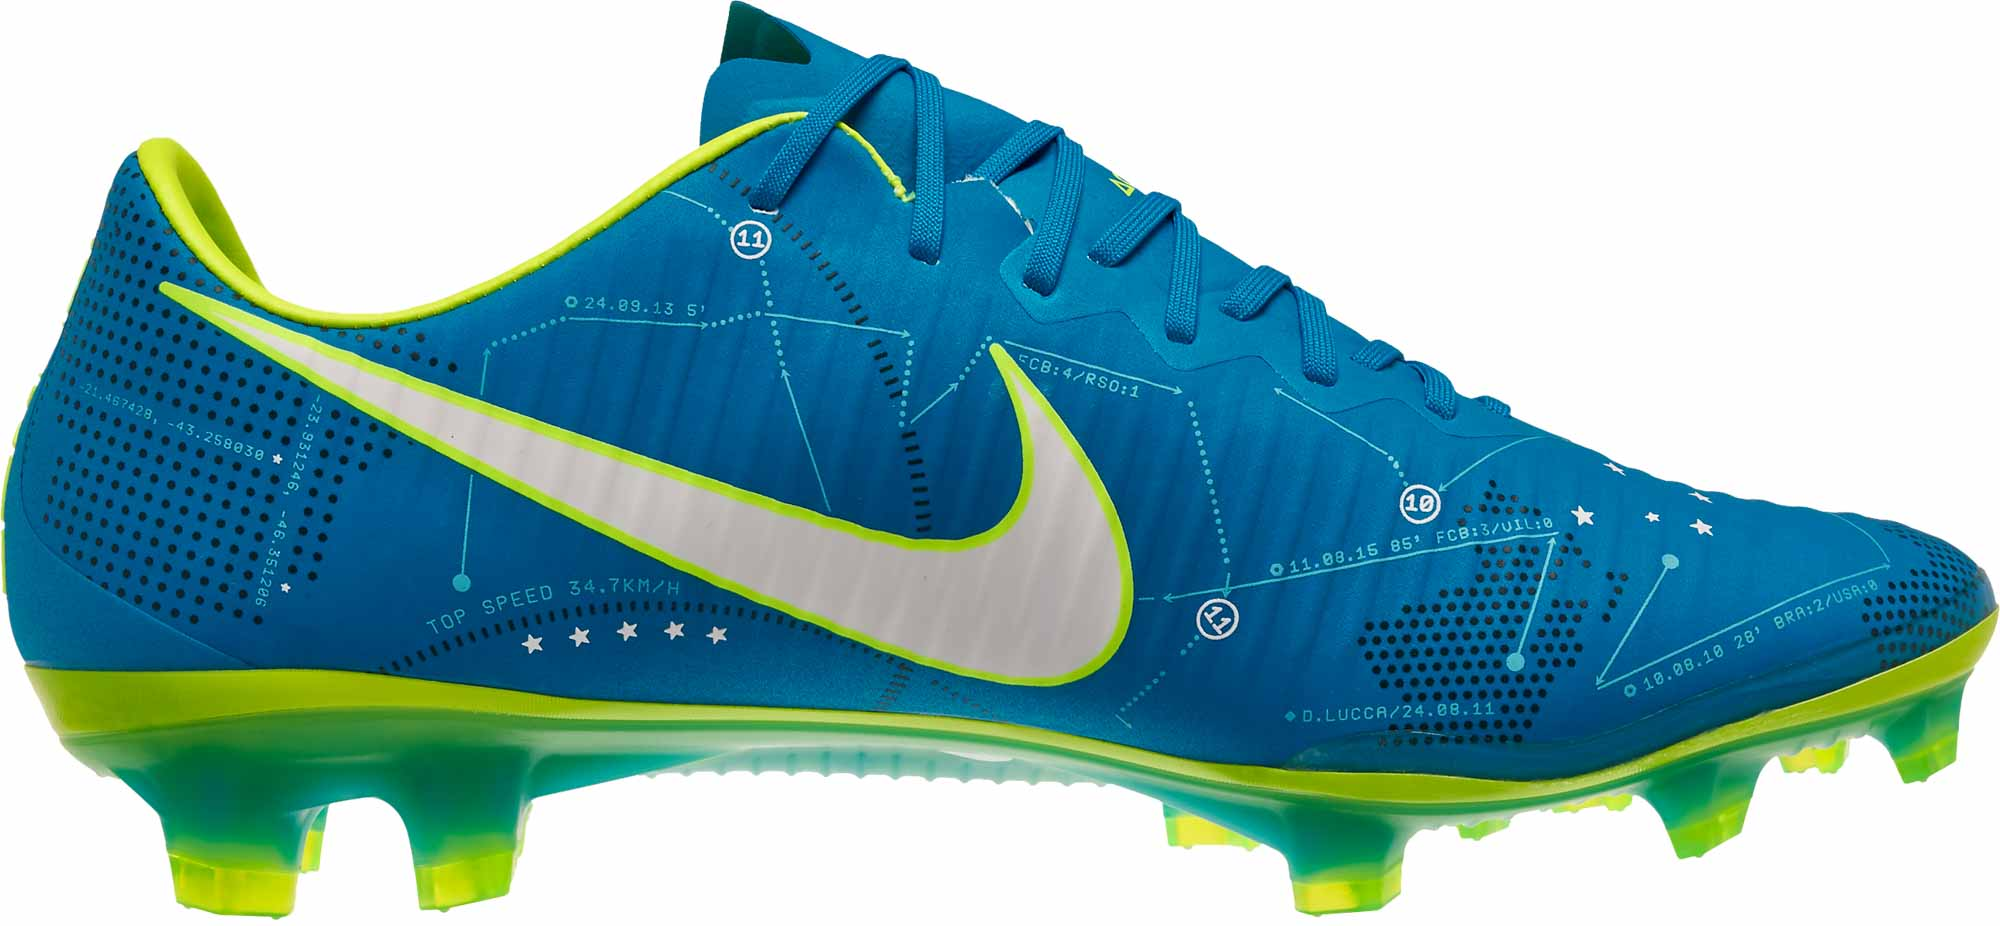 33c76abab29 Nike Mercurial Vapor XI SX FG – Neymar – Blue Orbit White